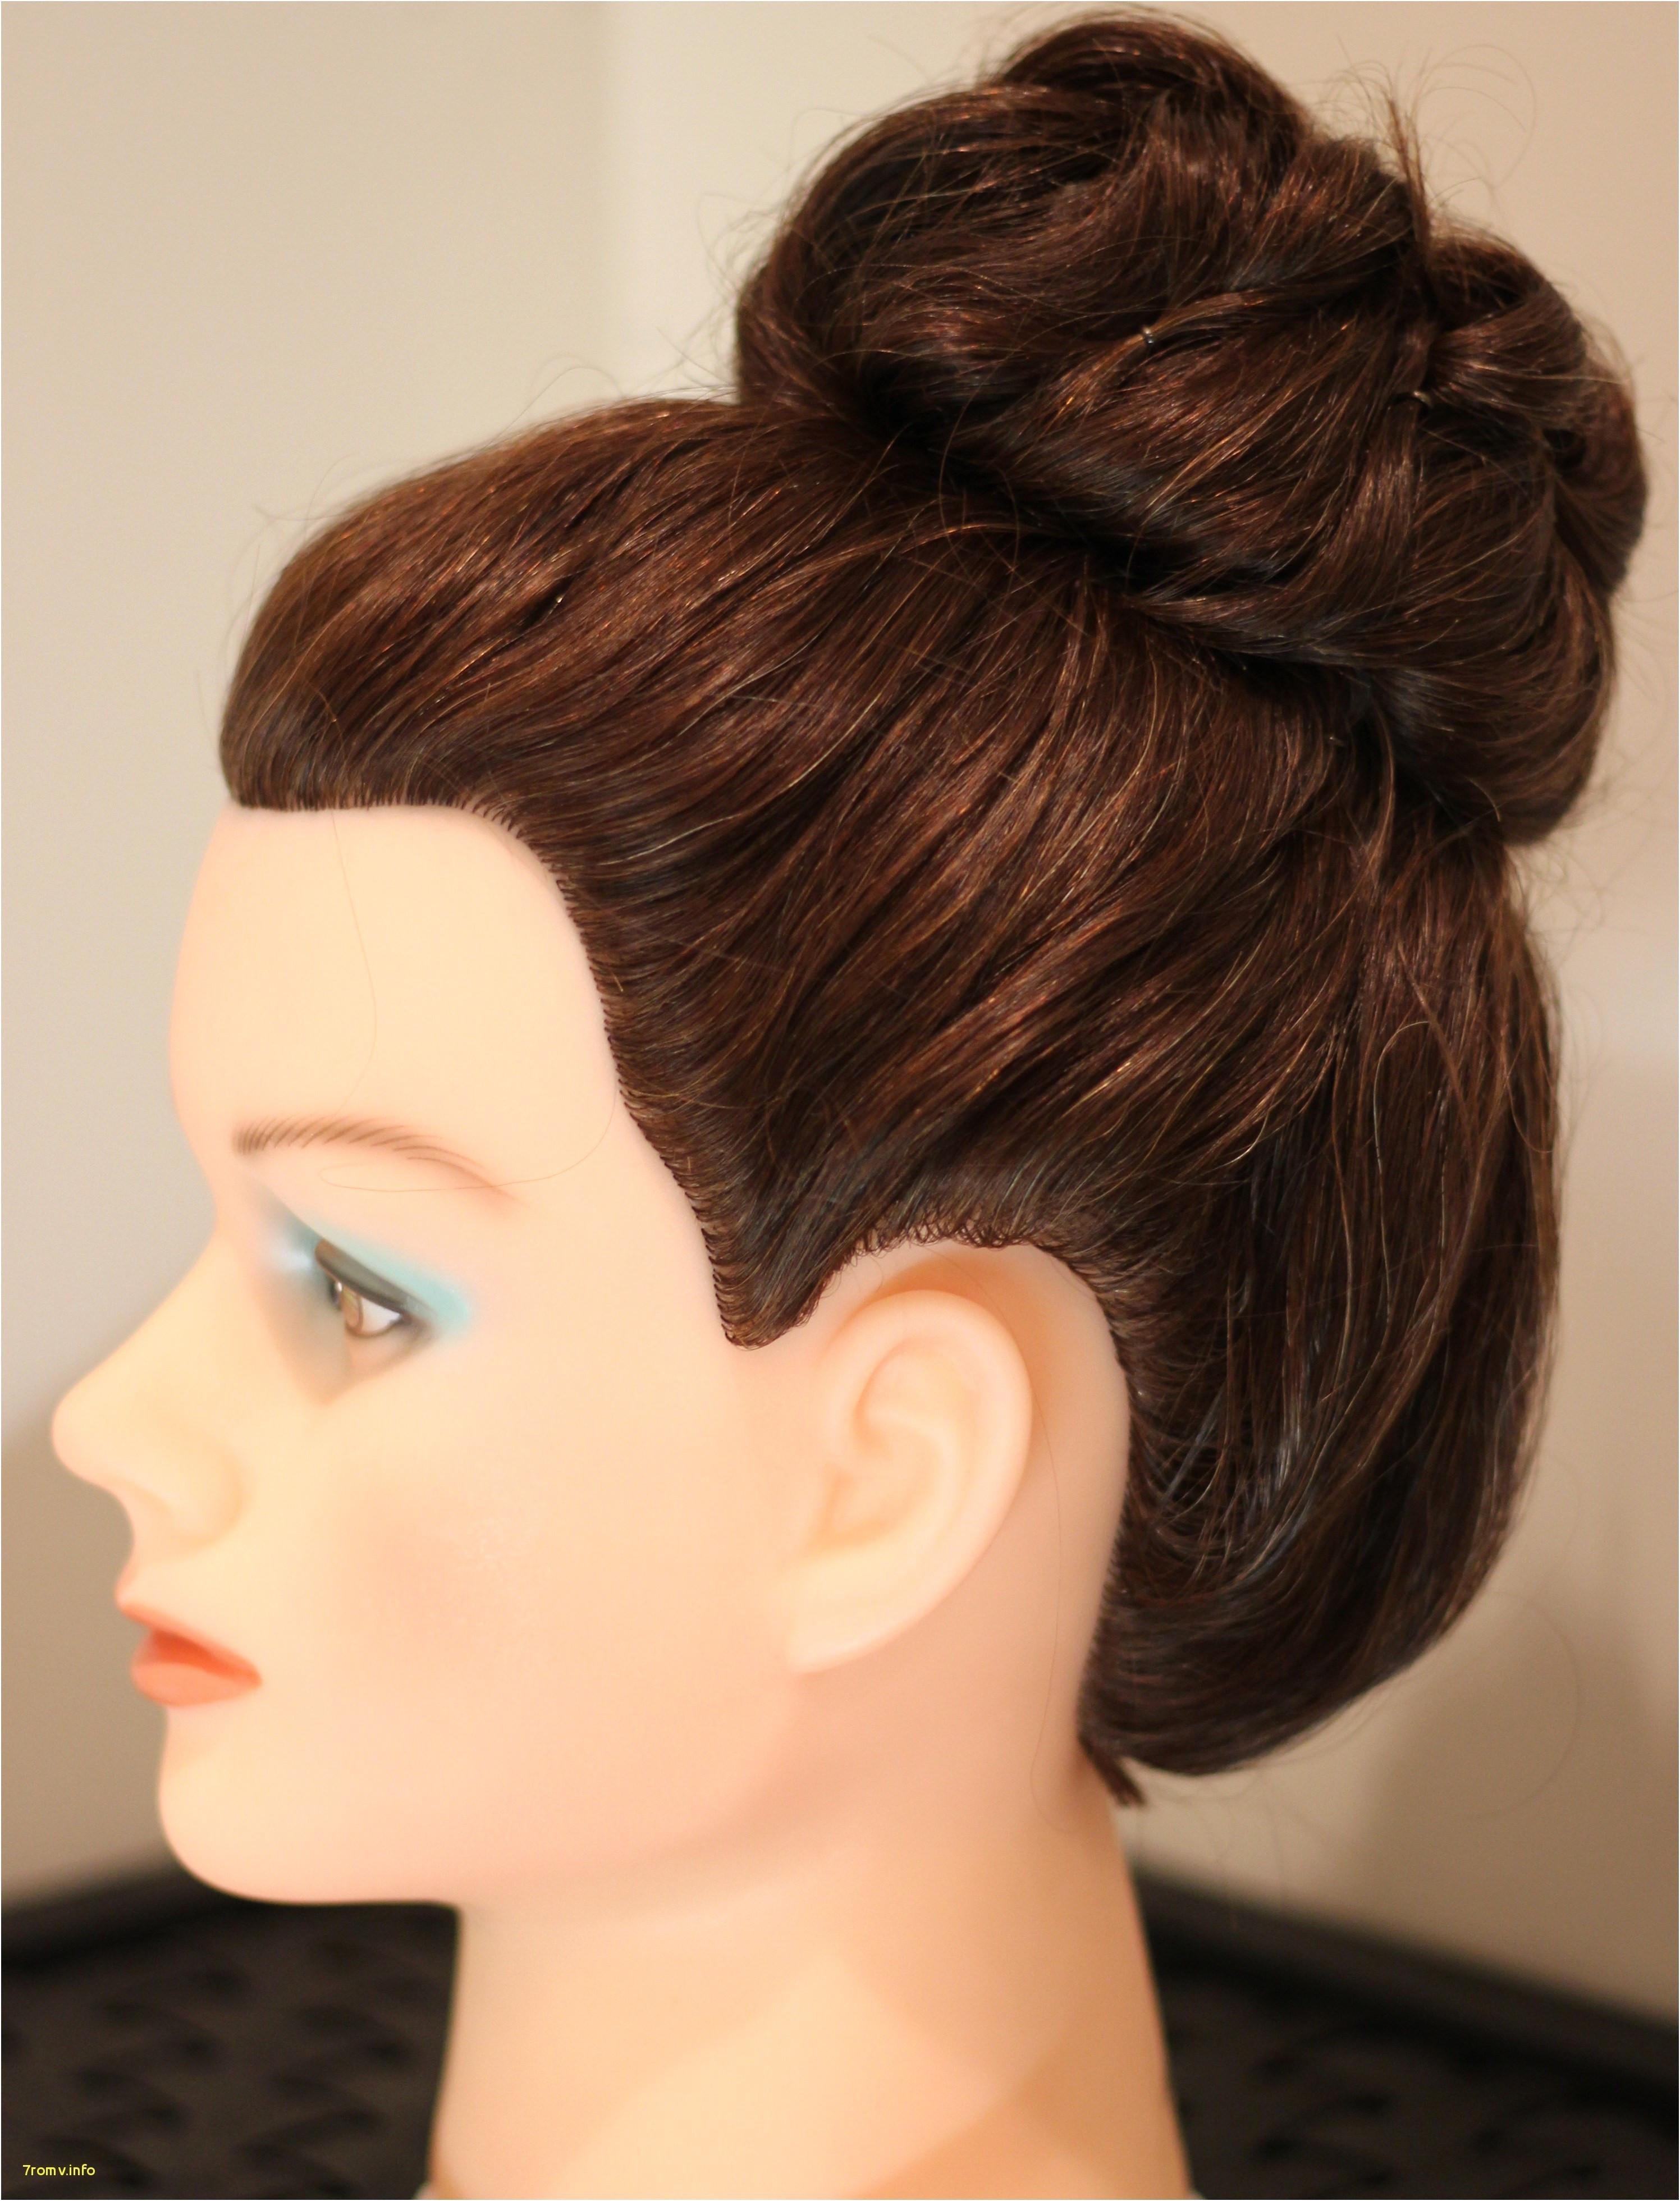 Asian Bridal Hair Awesome 17 Elegant Wedding Guest Hair And Makeup Arts